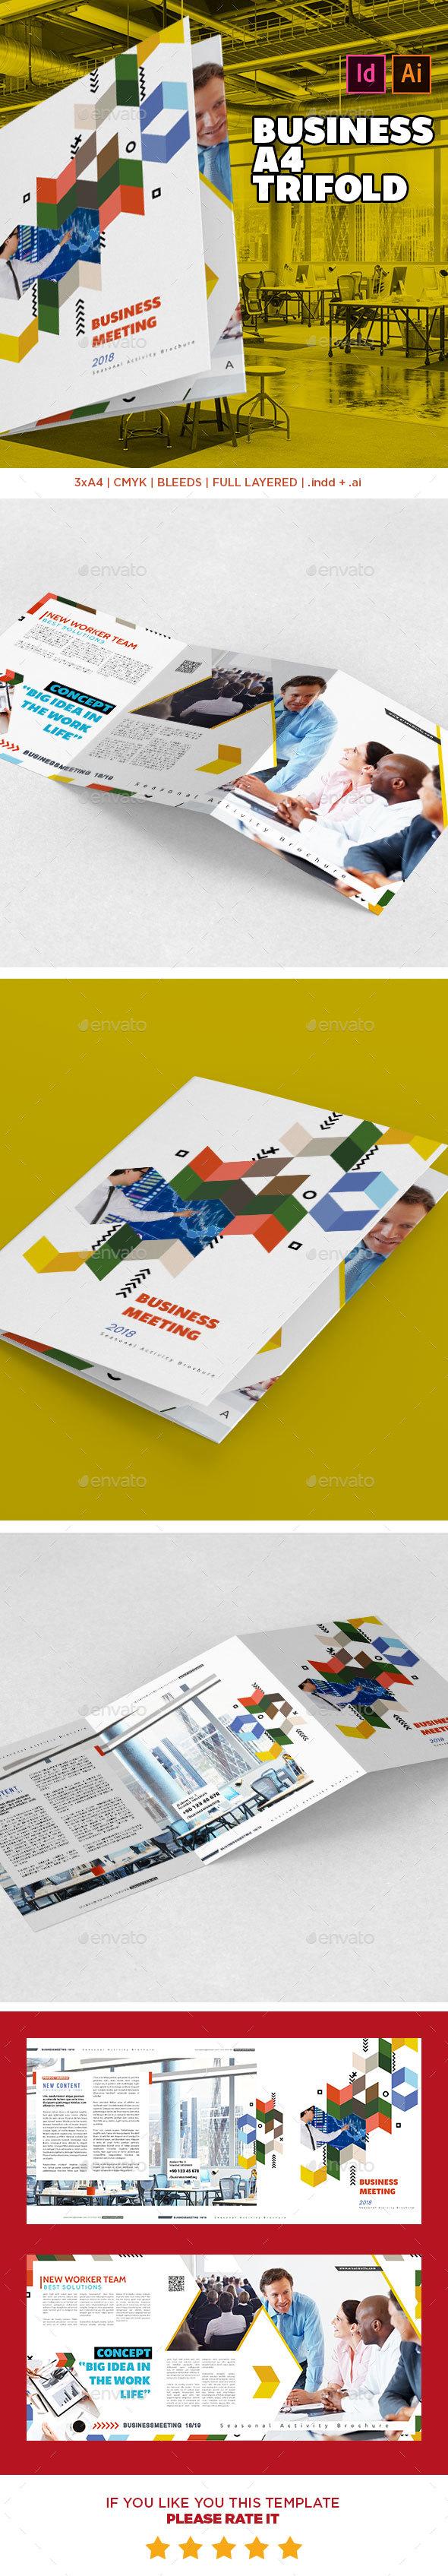 Business Tri-Fold Brochure Template 3xA4 - Corporate Brochures